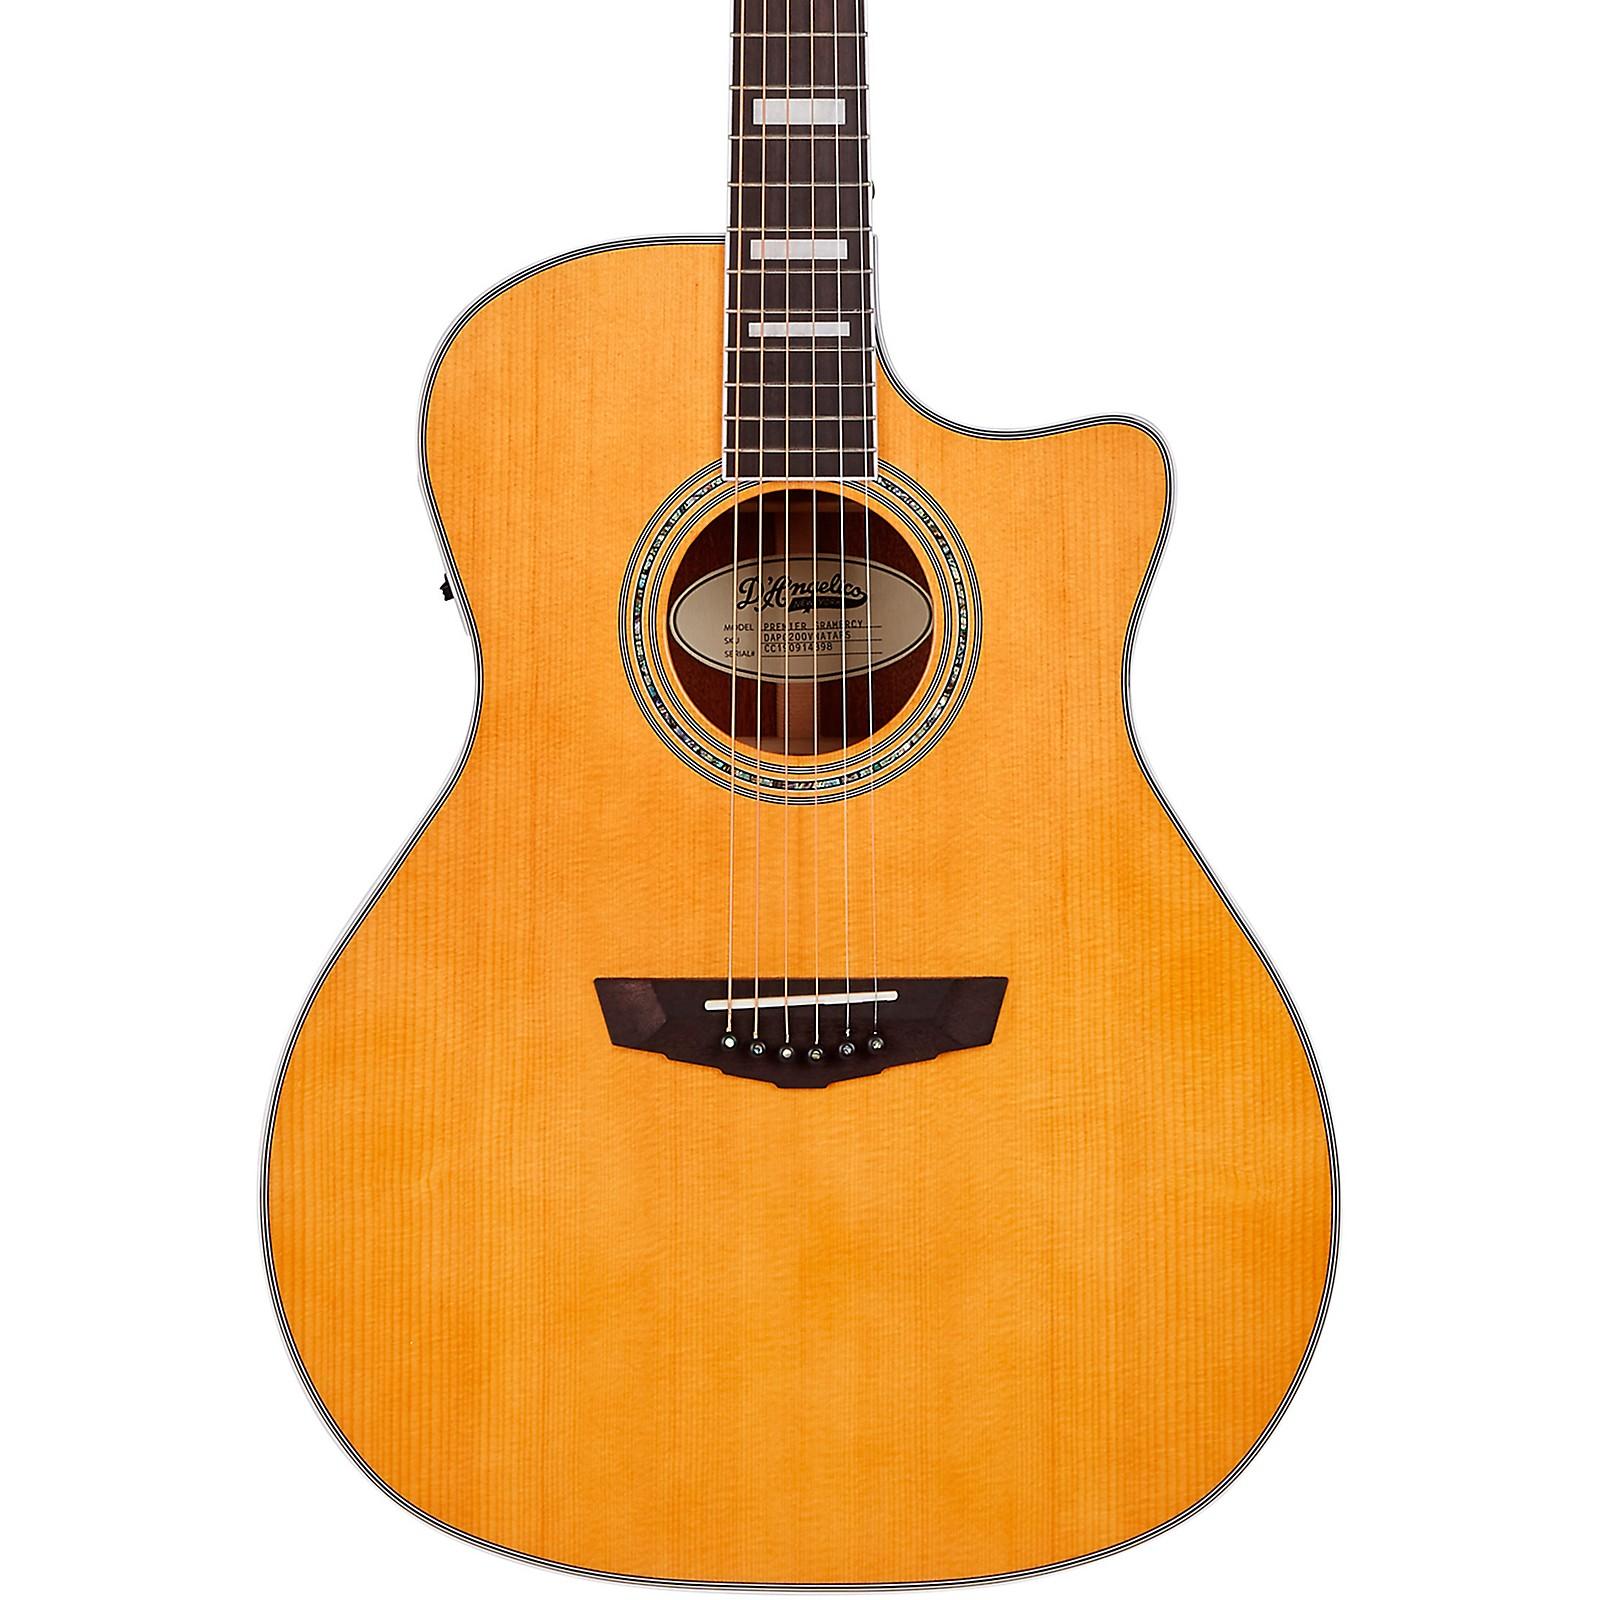 D'Angelico Premier Series Gramercy Single Cutaway Grand Auditorium Acoustic-Electric Guitar